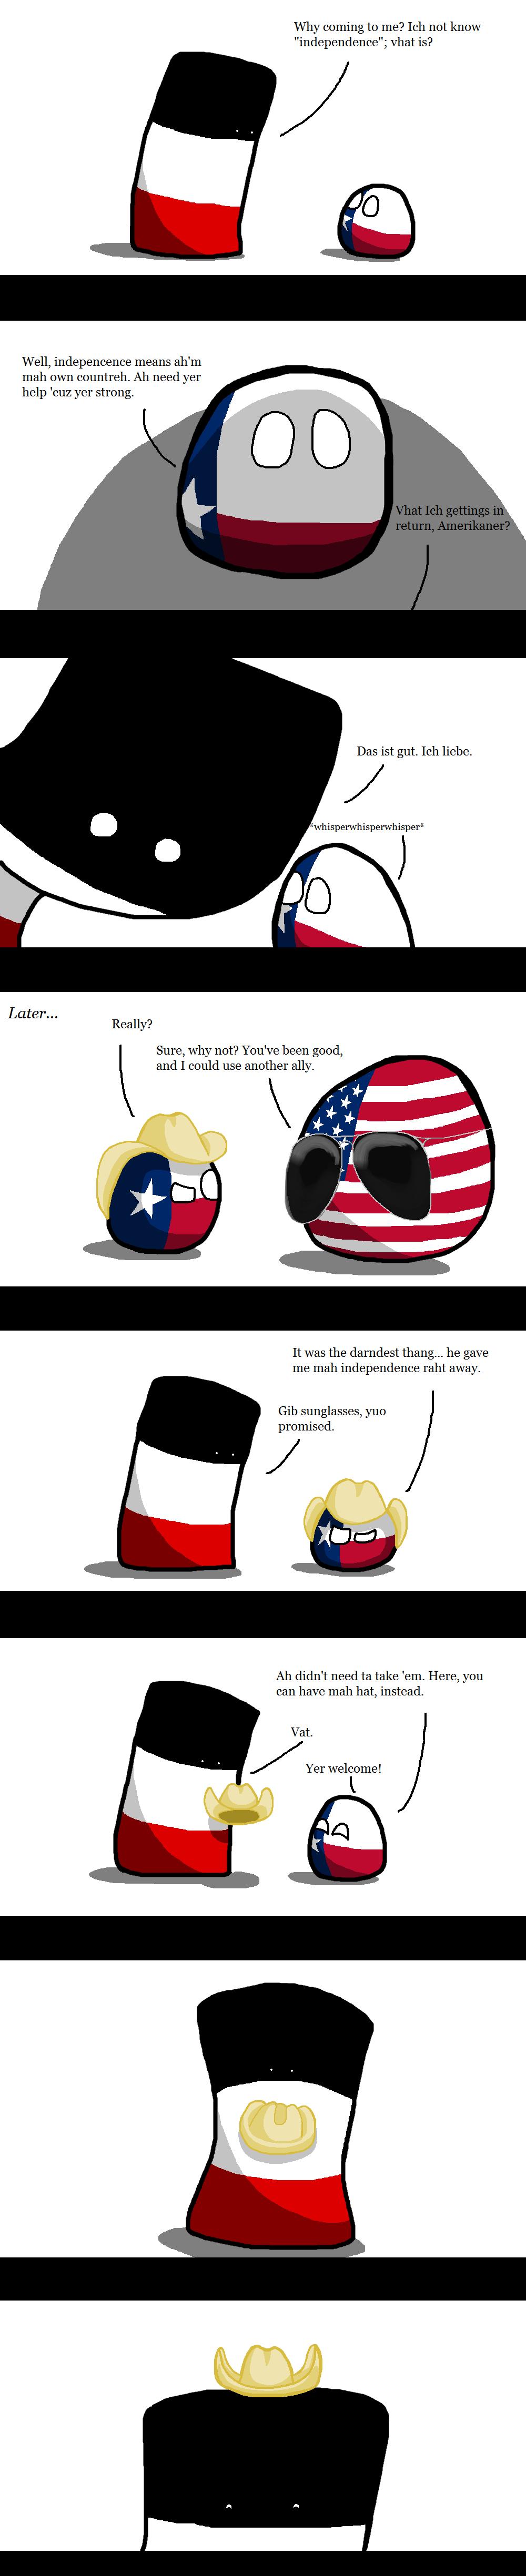 b56efb0fcce4d7004812b285116c2df0 texas and reichtangle polandball, satw and co pinterest,Texas History Funny Meme